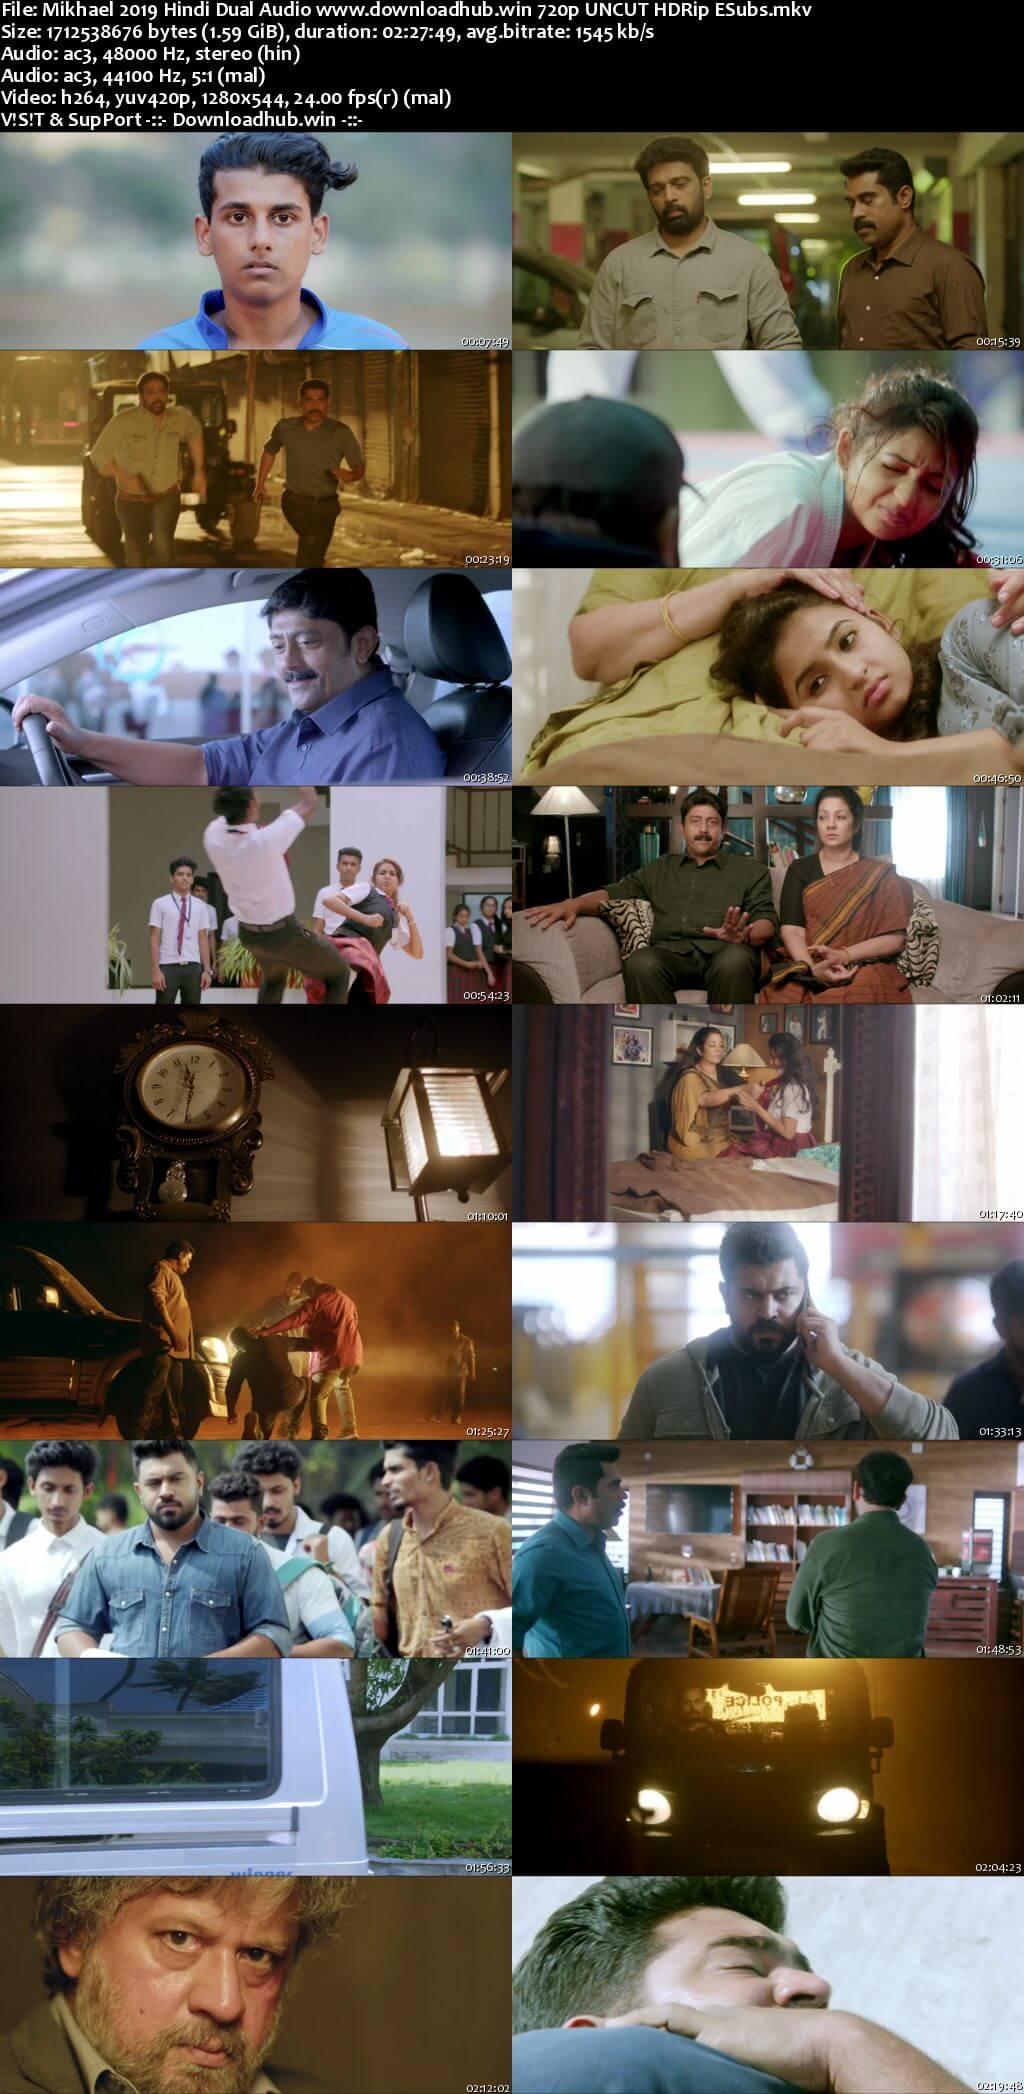 Mikhael 2019 Hindi Dual Audio 720p UNCUT HDRip ESubs